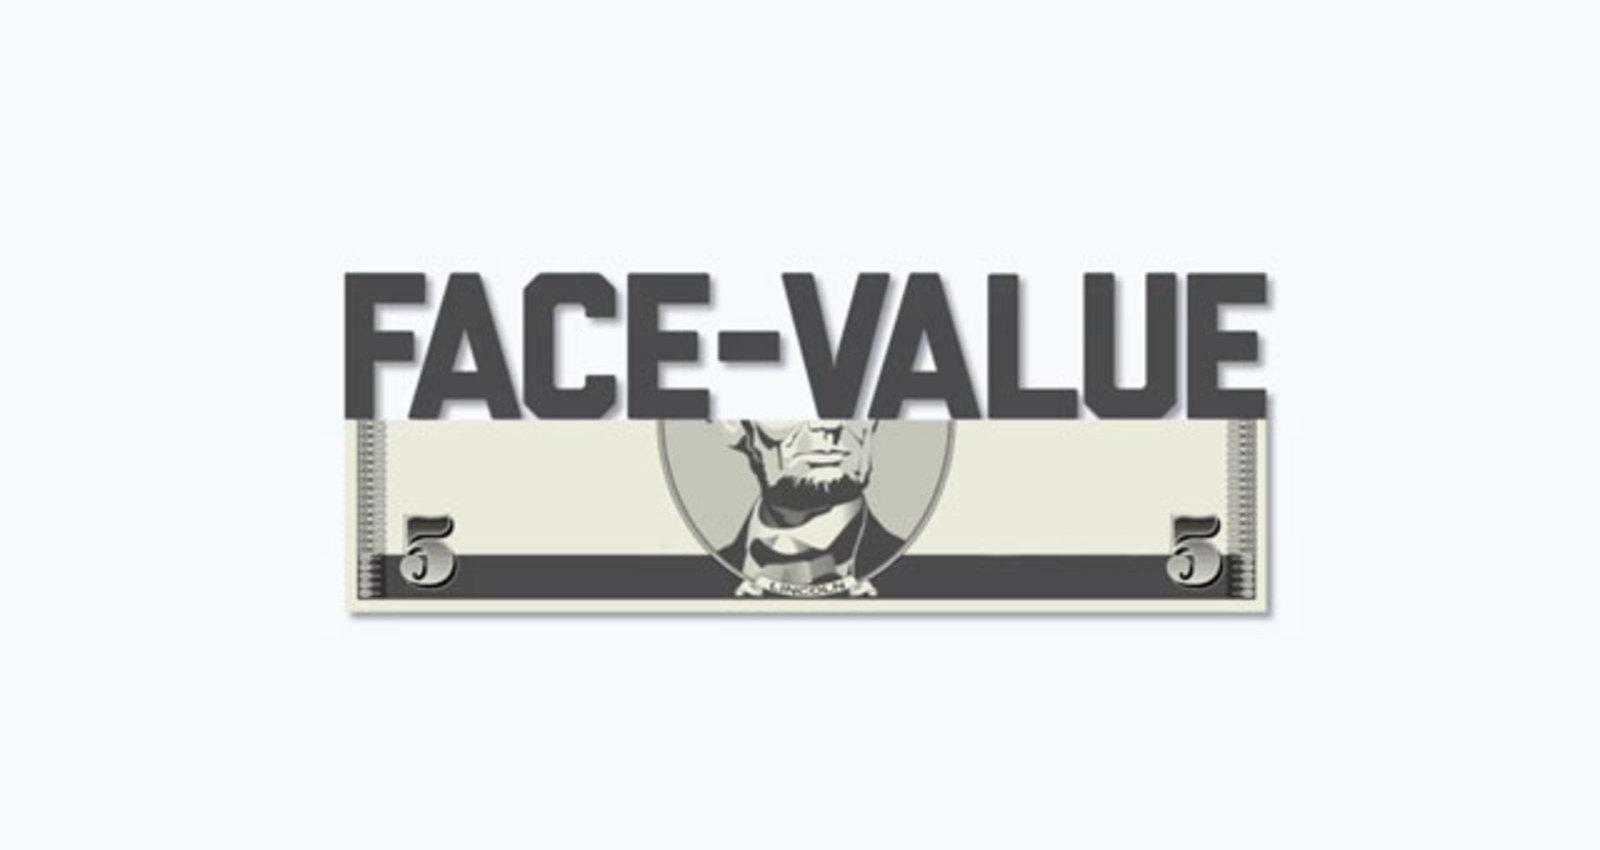 Face-Value Microsite